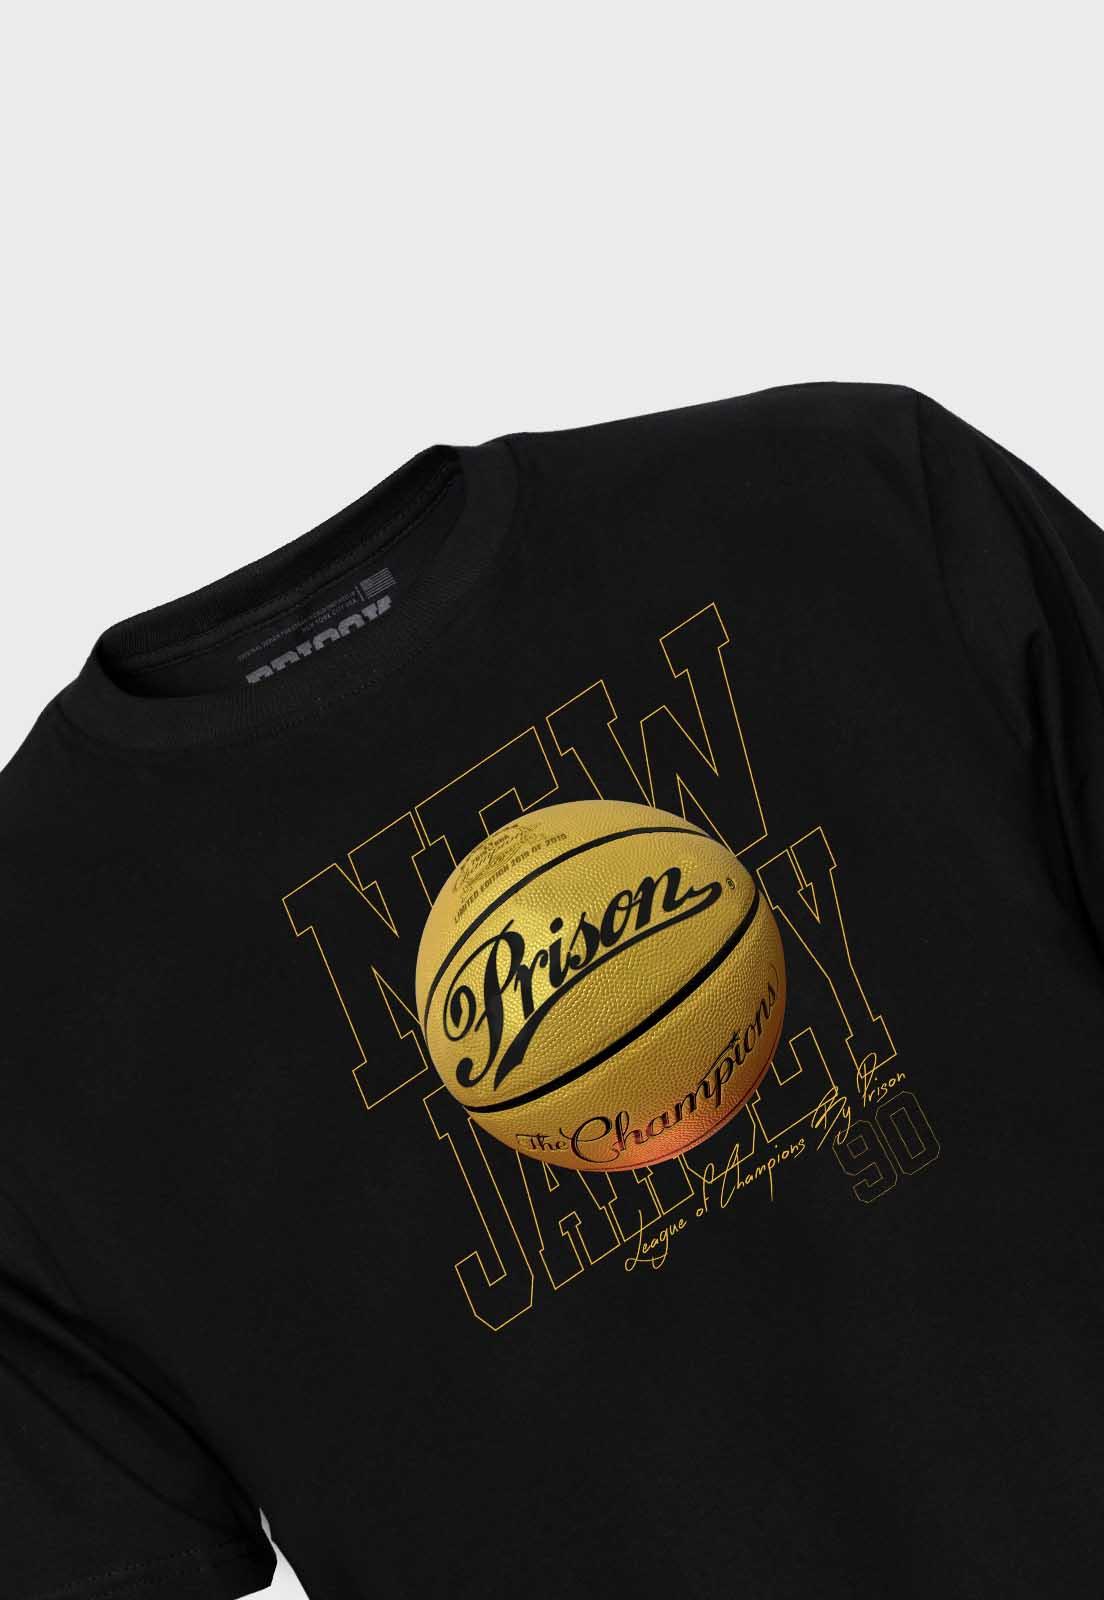 Camiseta Streetwear Prison New Jersey Gold Balll